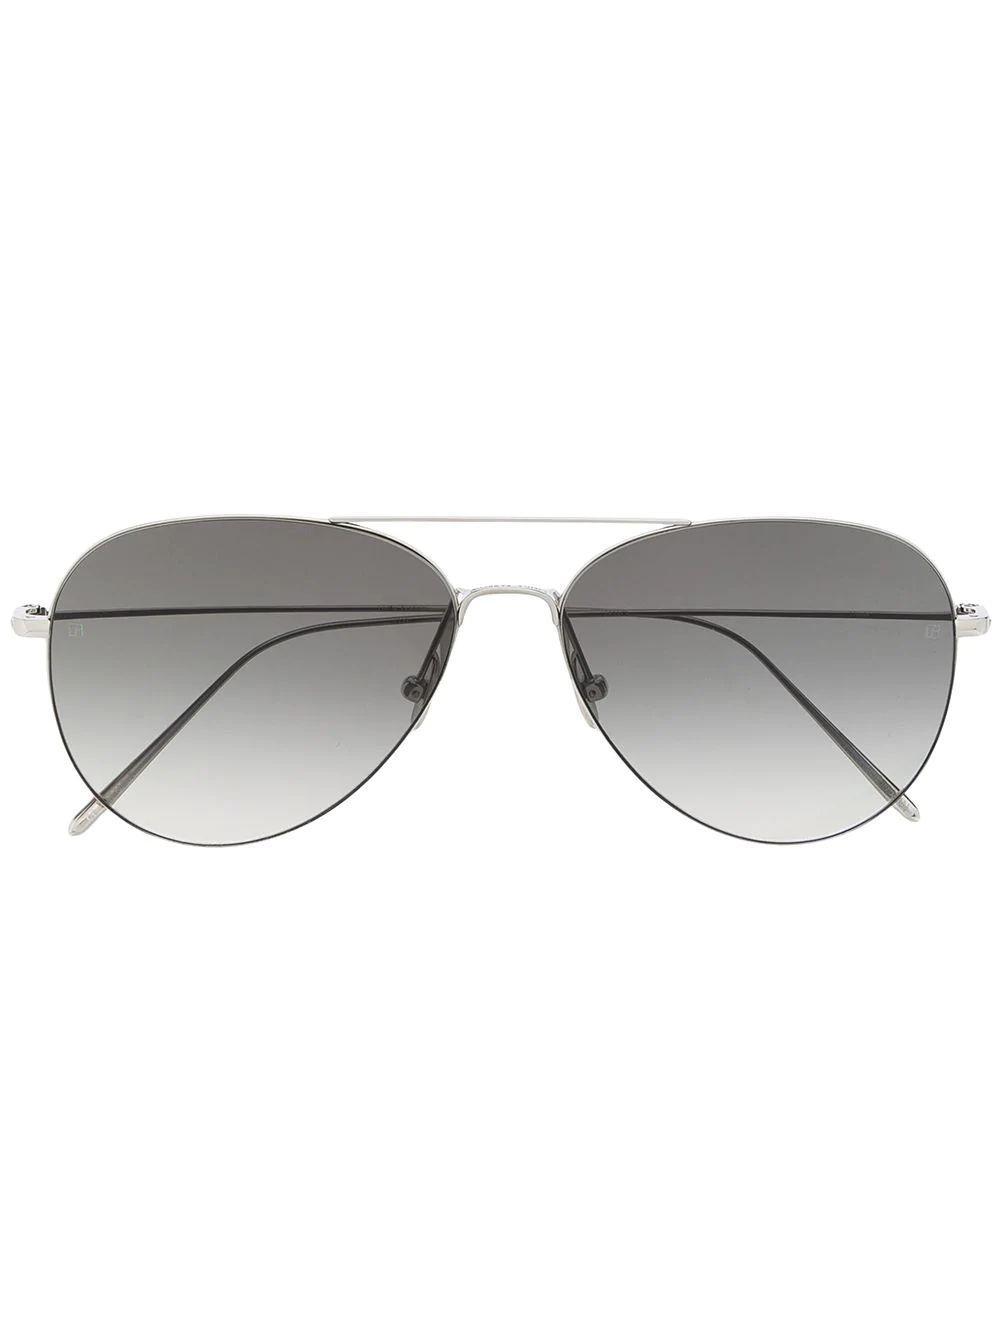 Lloyds Aviator Sunglasses Item # LF31C2SUN-C